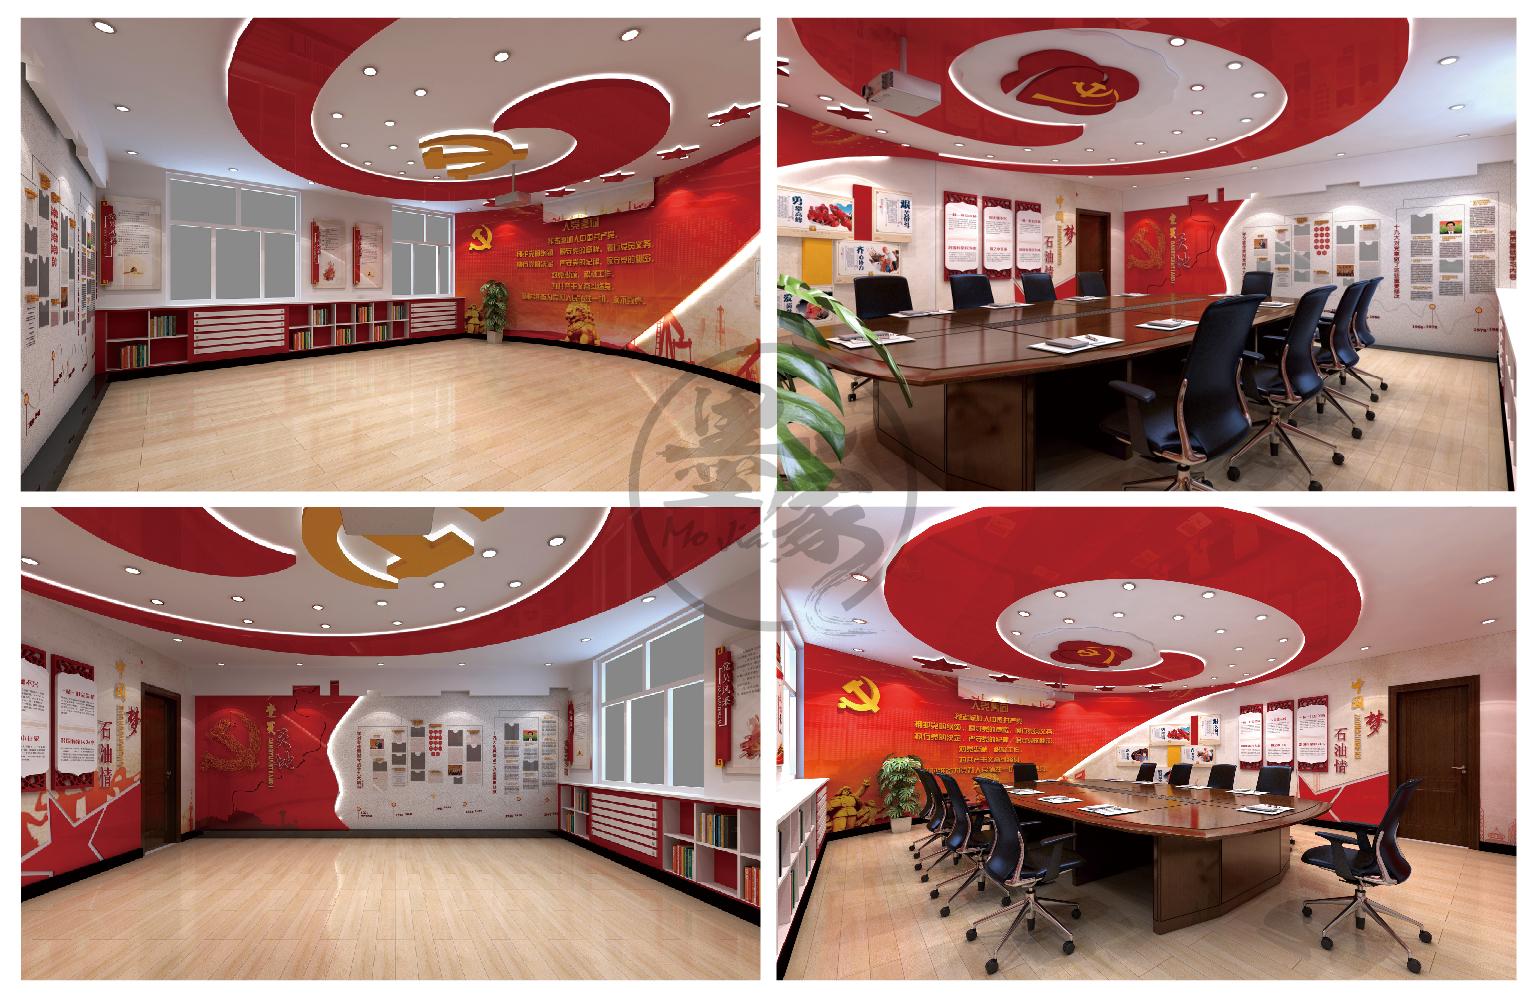 vr党建党员展厅红色企业文化墙服务活动中心企业建党周年庆设计